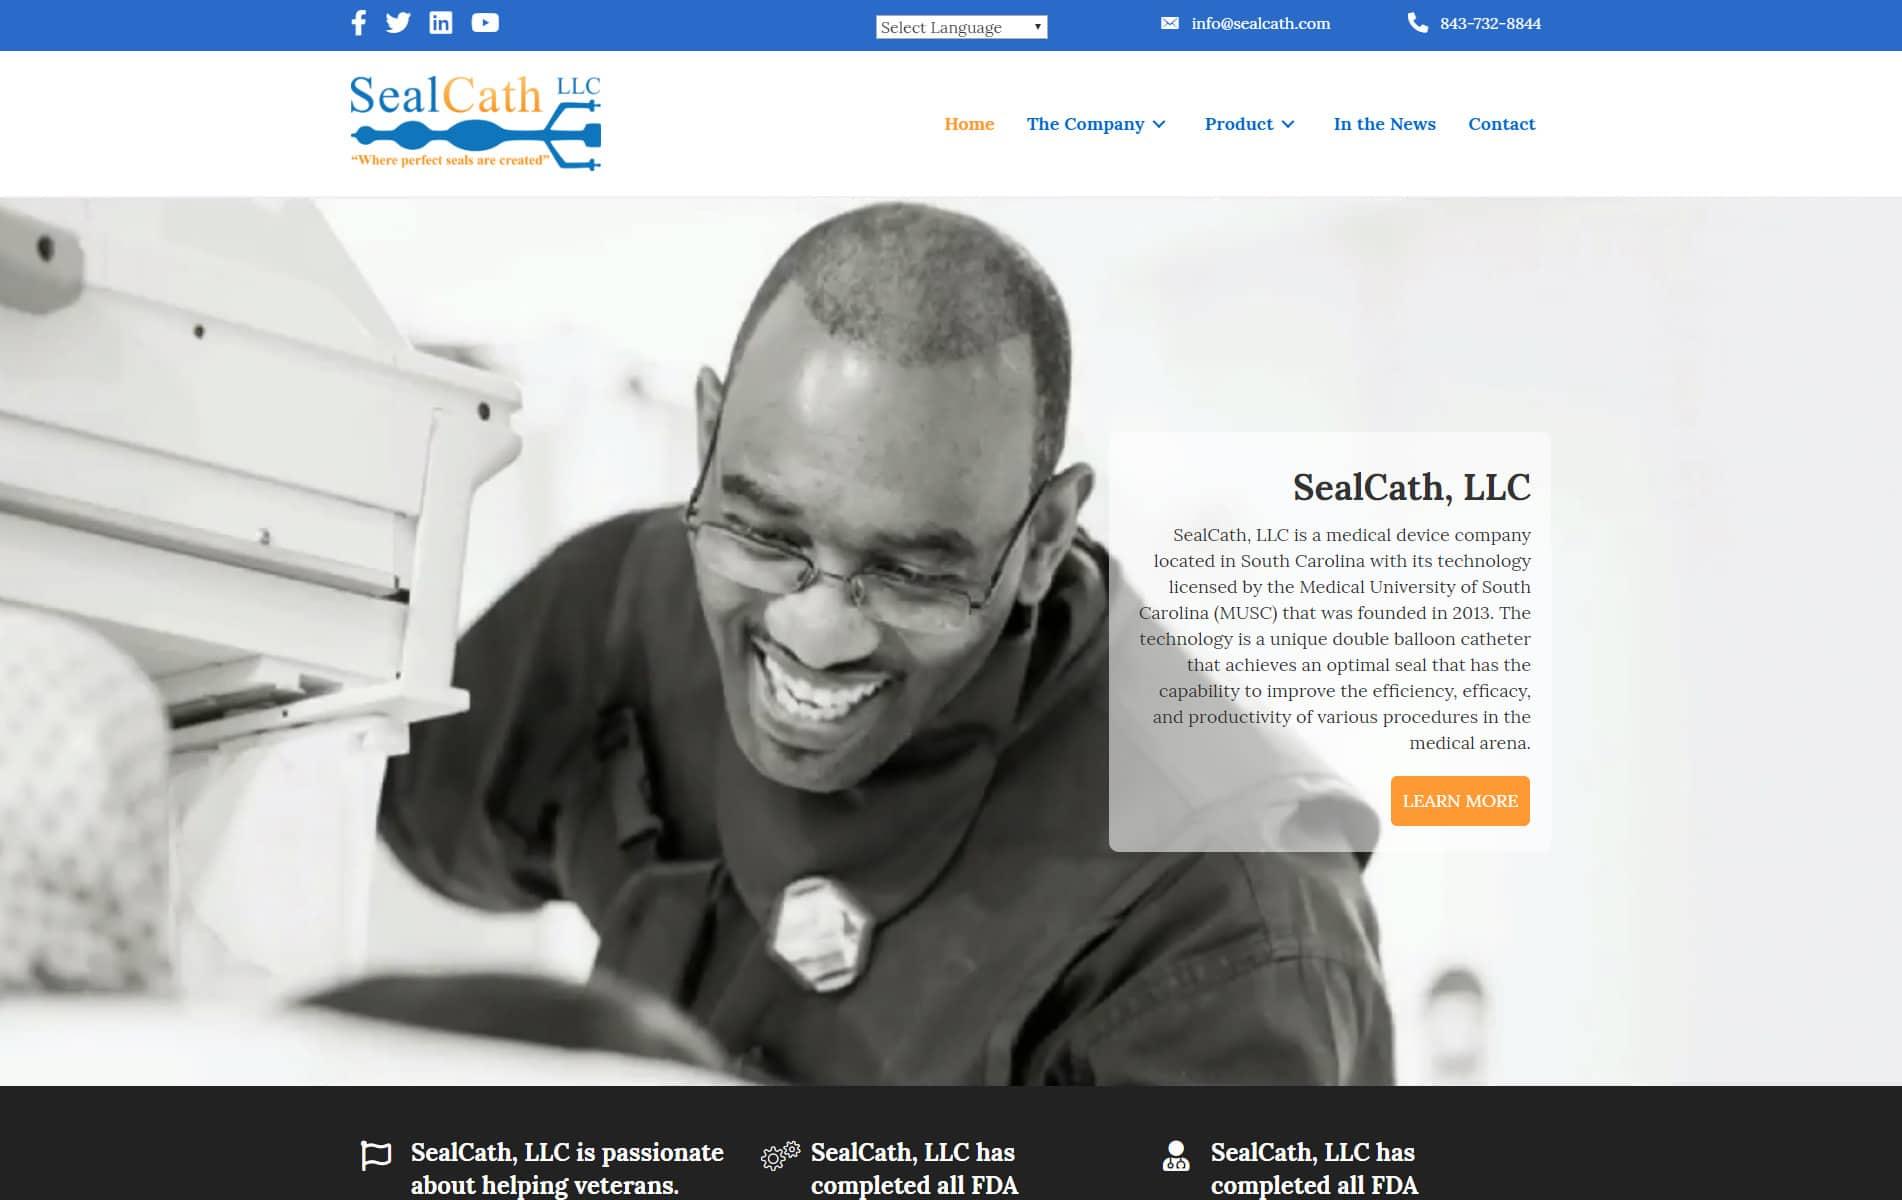 Screenshot of SealCath Web Site